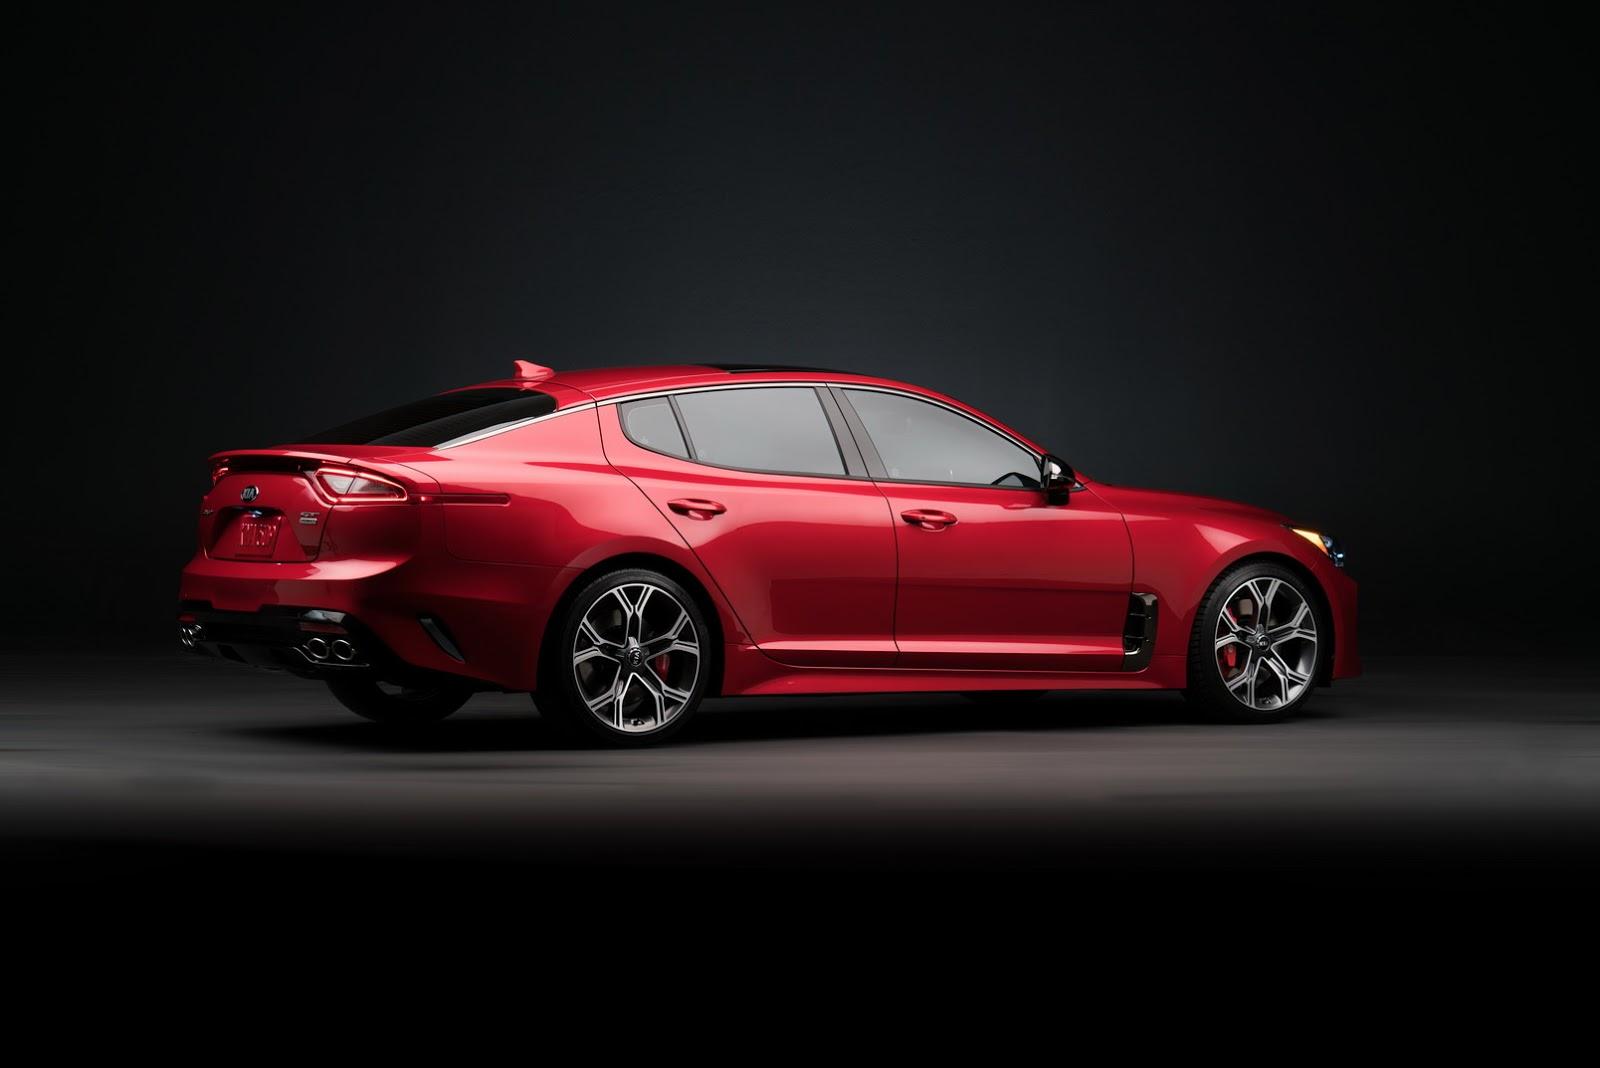 2018 Kia Stinger GT (1)